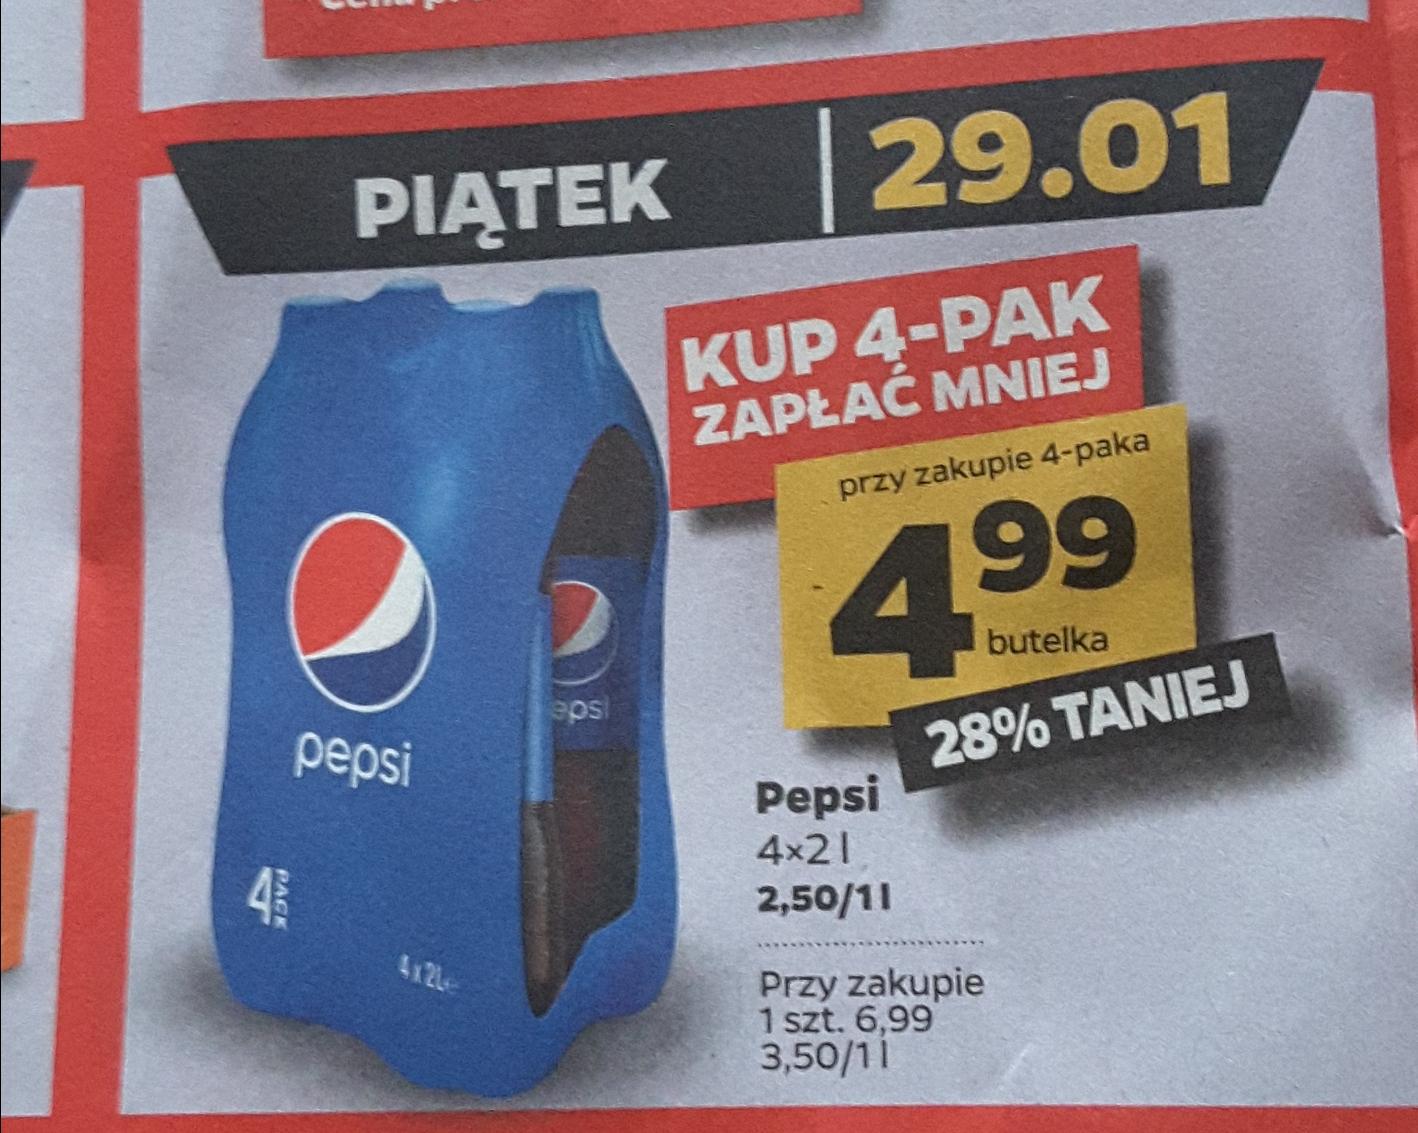 Pepsi 2 litry w Netto TYLKO 29.01